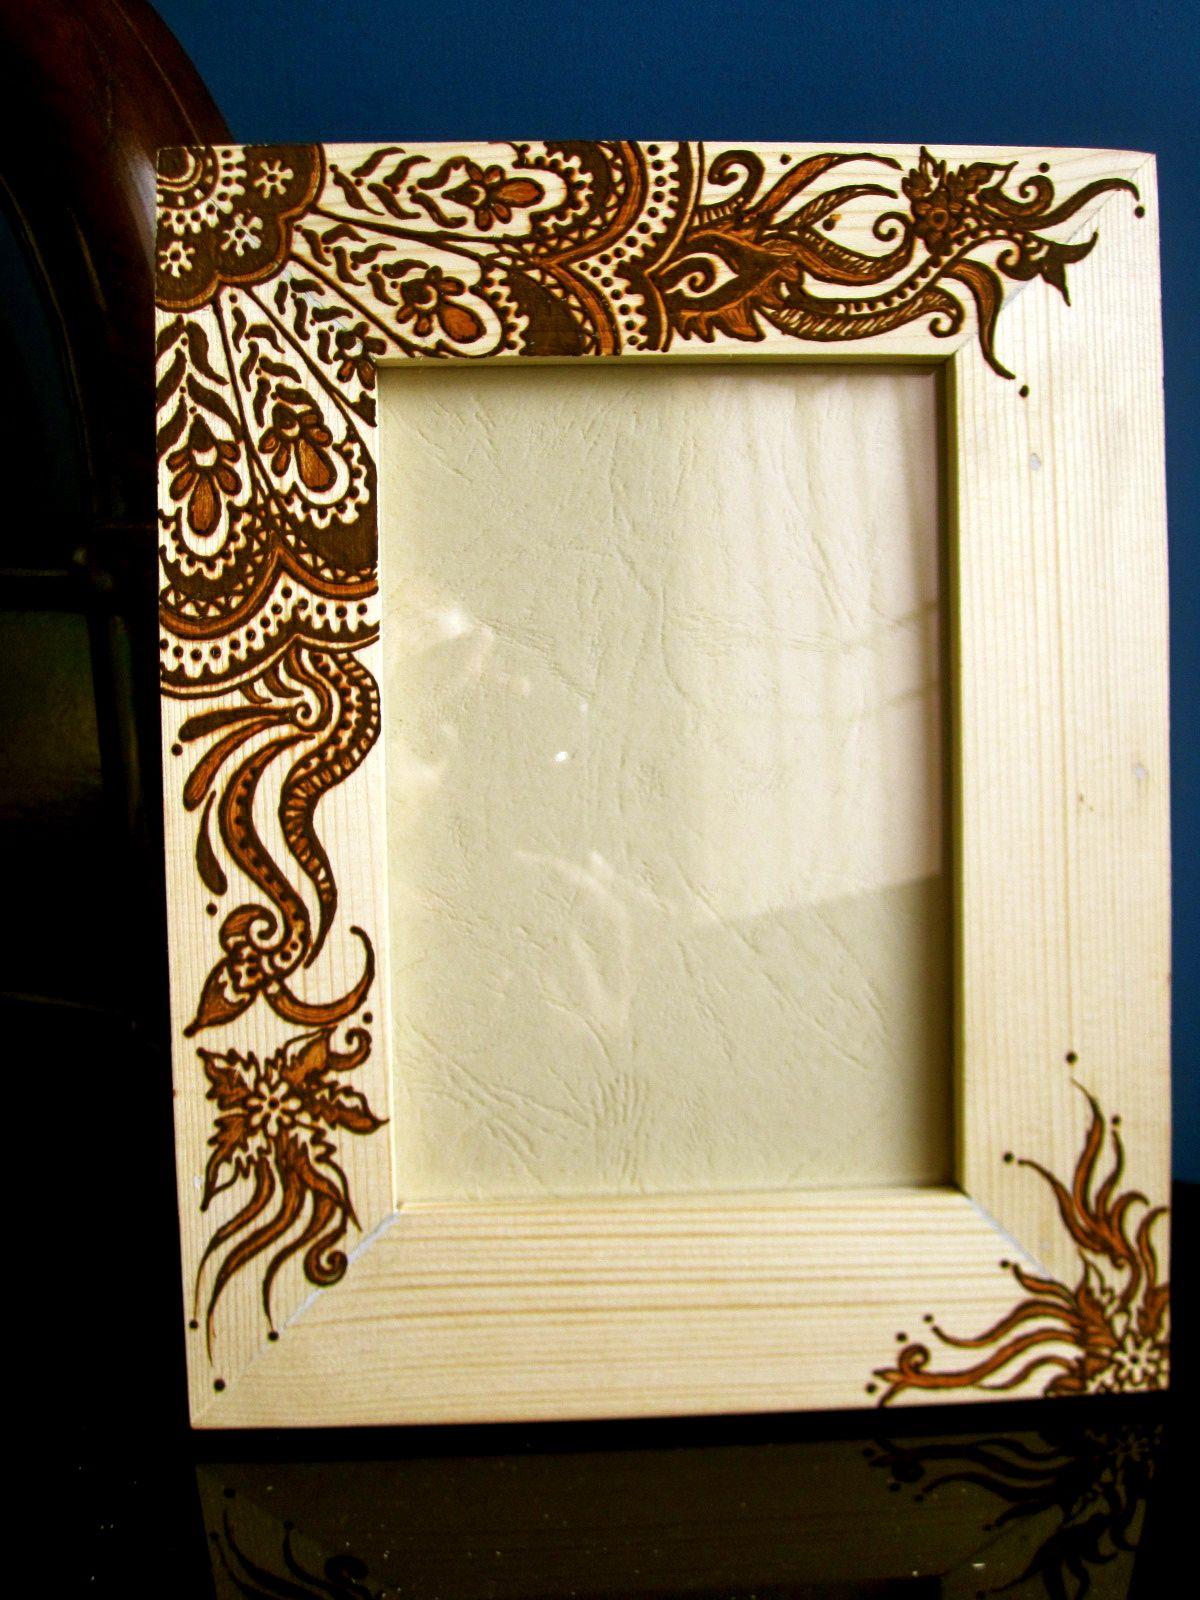 henna frame created by sara 39 s henna henna crafts pinterest hennas and wood burning. Black Bedroom Furniture Sets. Home Design Ideas